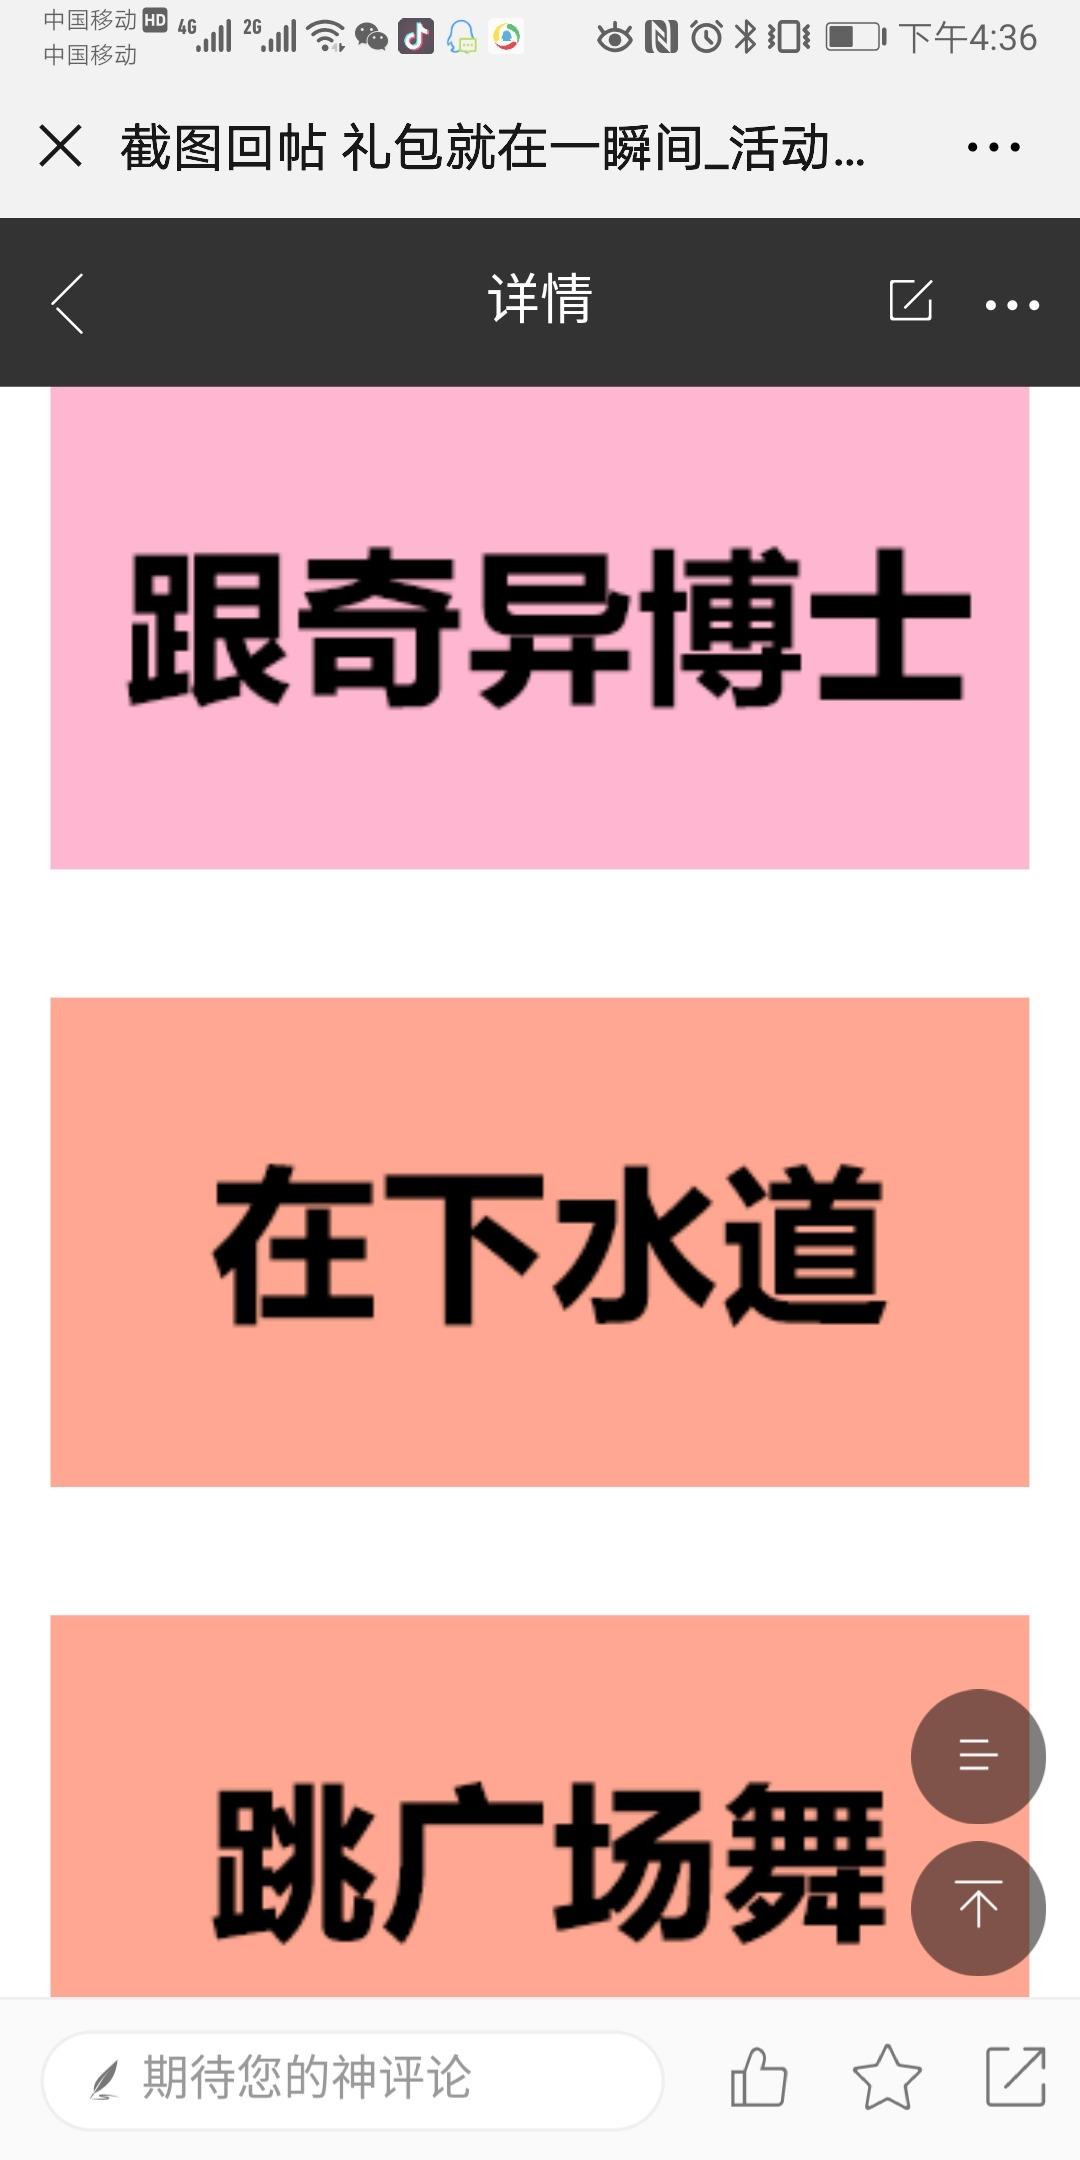 Screenshot_20190725_163648_com.tencent.mm.jpg